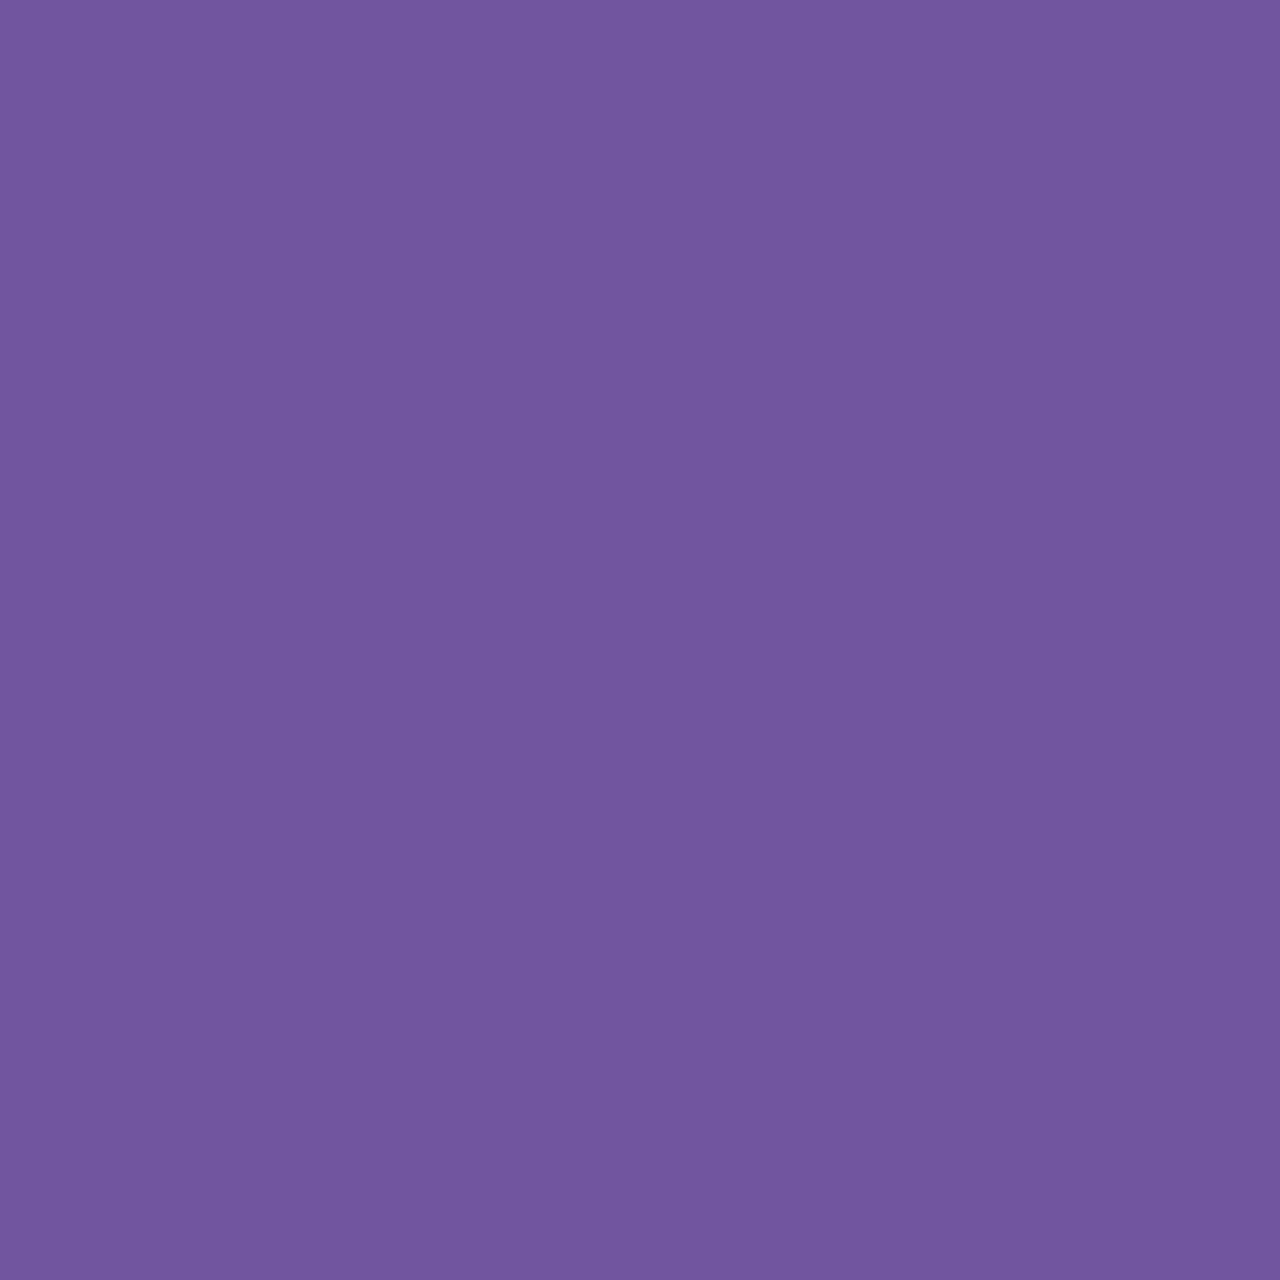 Rosco Calcolor Sheet #4960: 60 Lavender, Gels